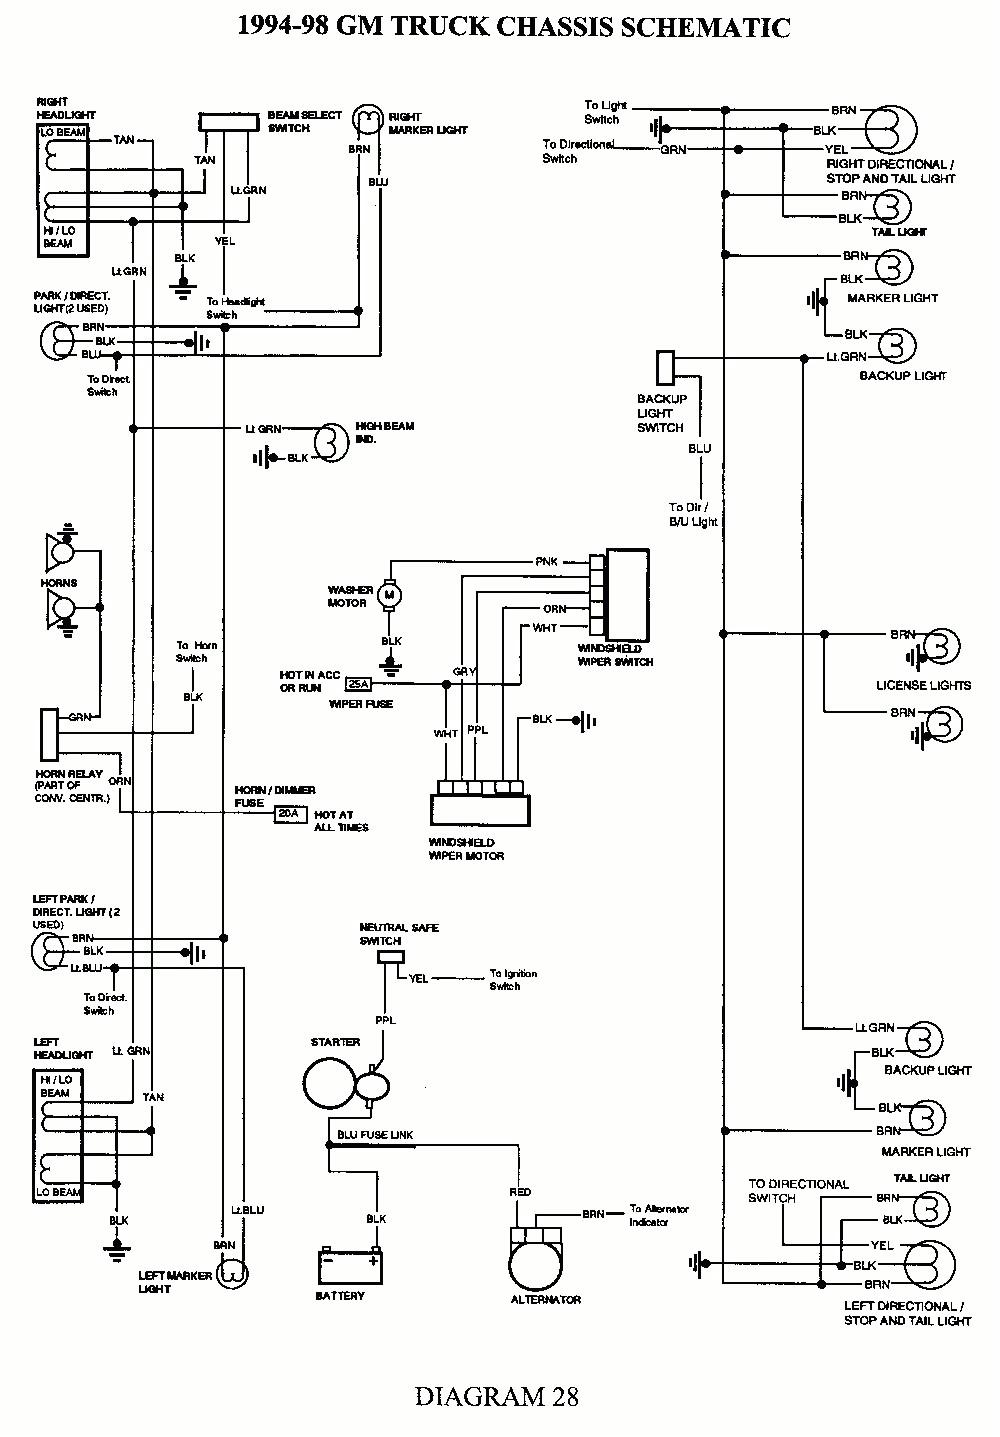 1996 blazer fuse box lights wiring diagram 1996 chevy blazer wiring diagram tail lights